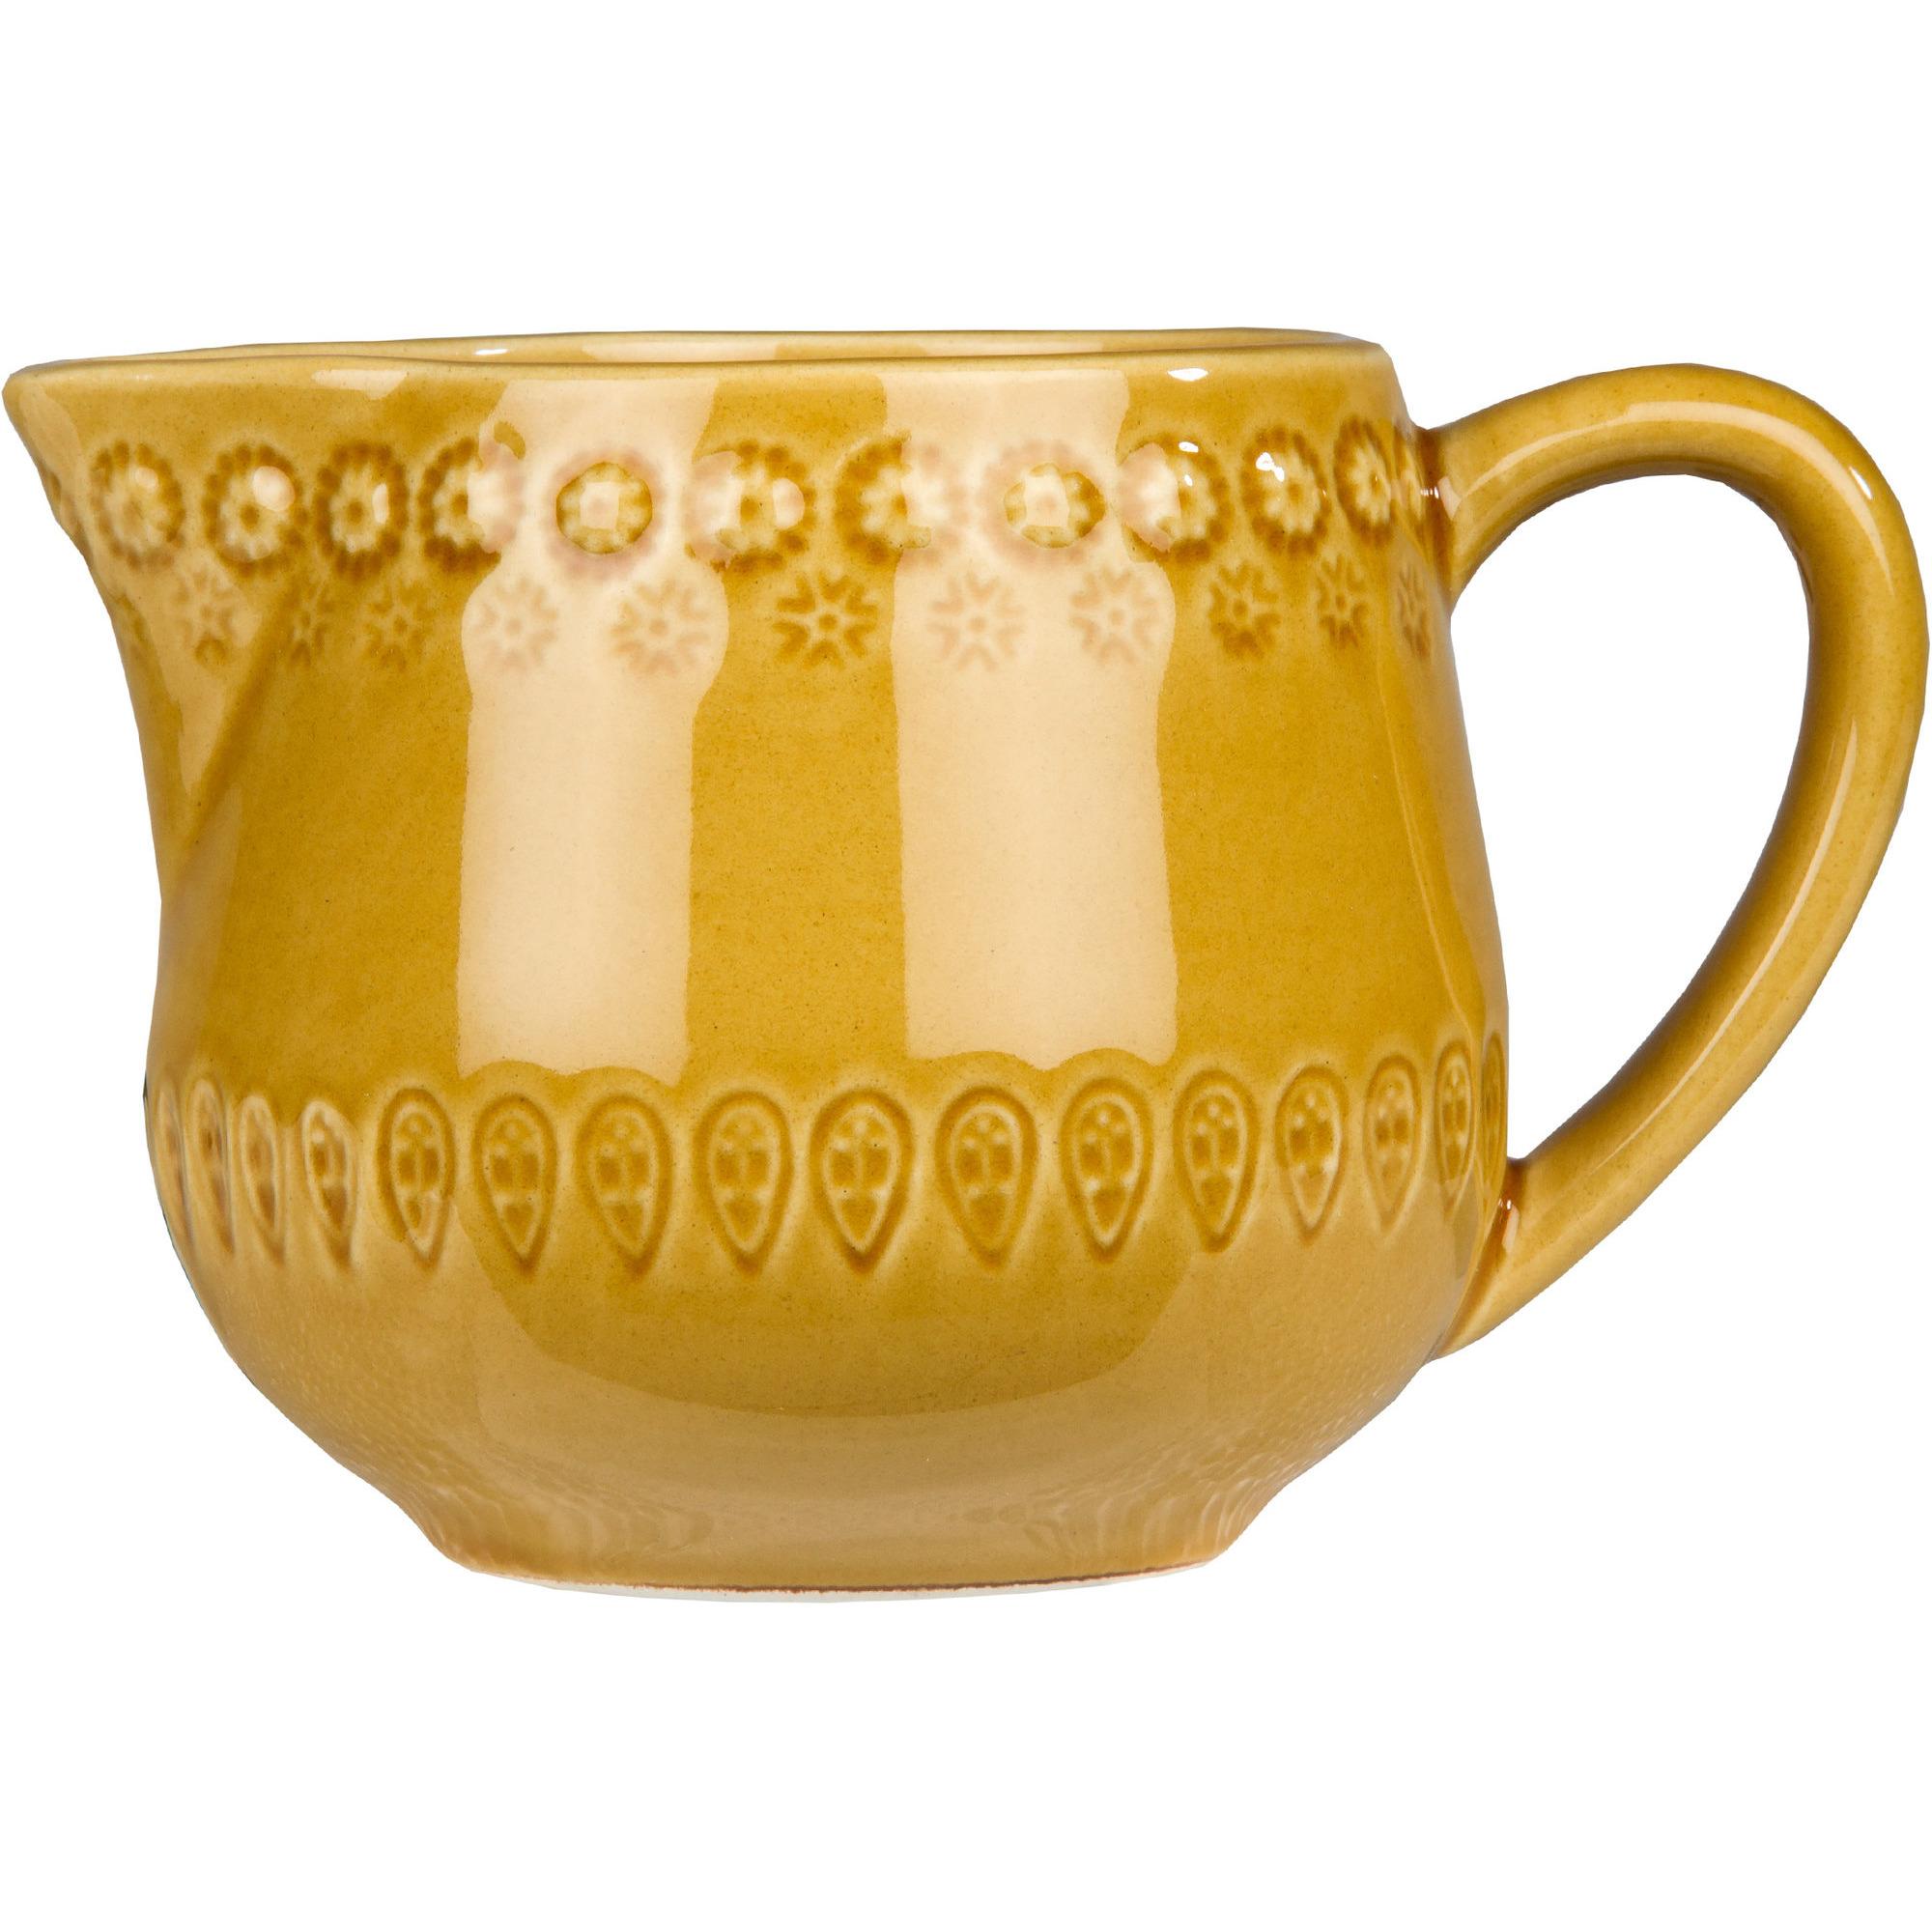 PotteryJo Daisy Mjölkkanna 30 cl Sienna